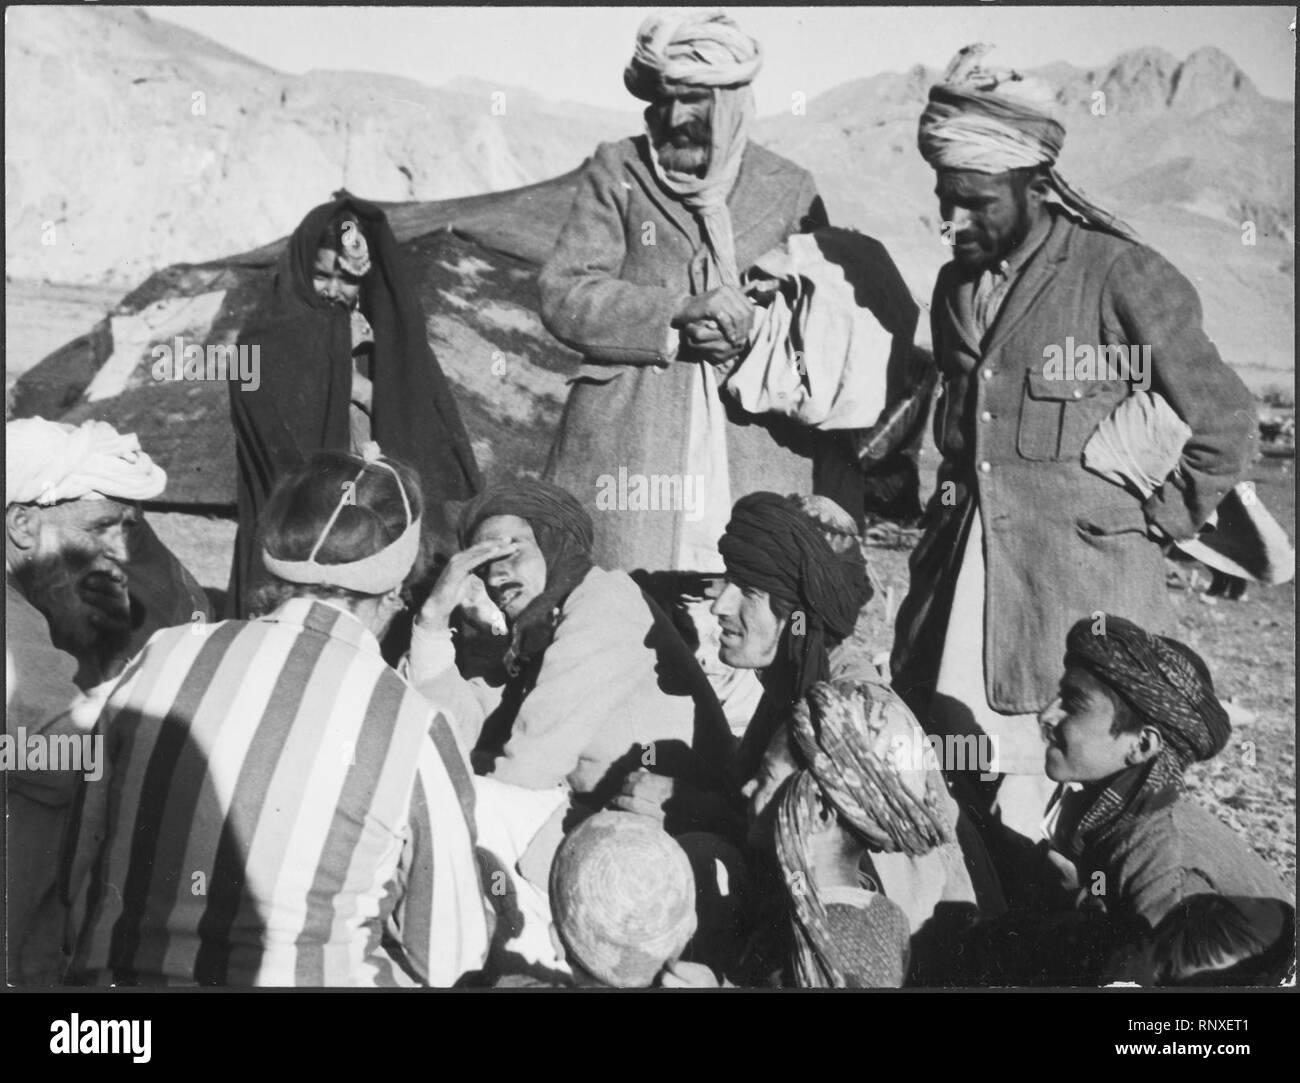 CH-NB - Afghanistan, Bamiyan, Bamyan (Bamian)- Menschen - Annemarie Schwarzenbach - SLA-Schwarzenbach-A-5-20-184. - Stock Image